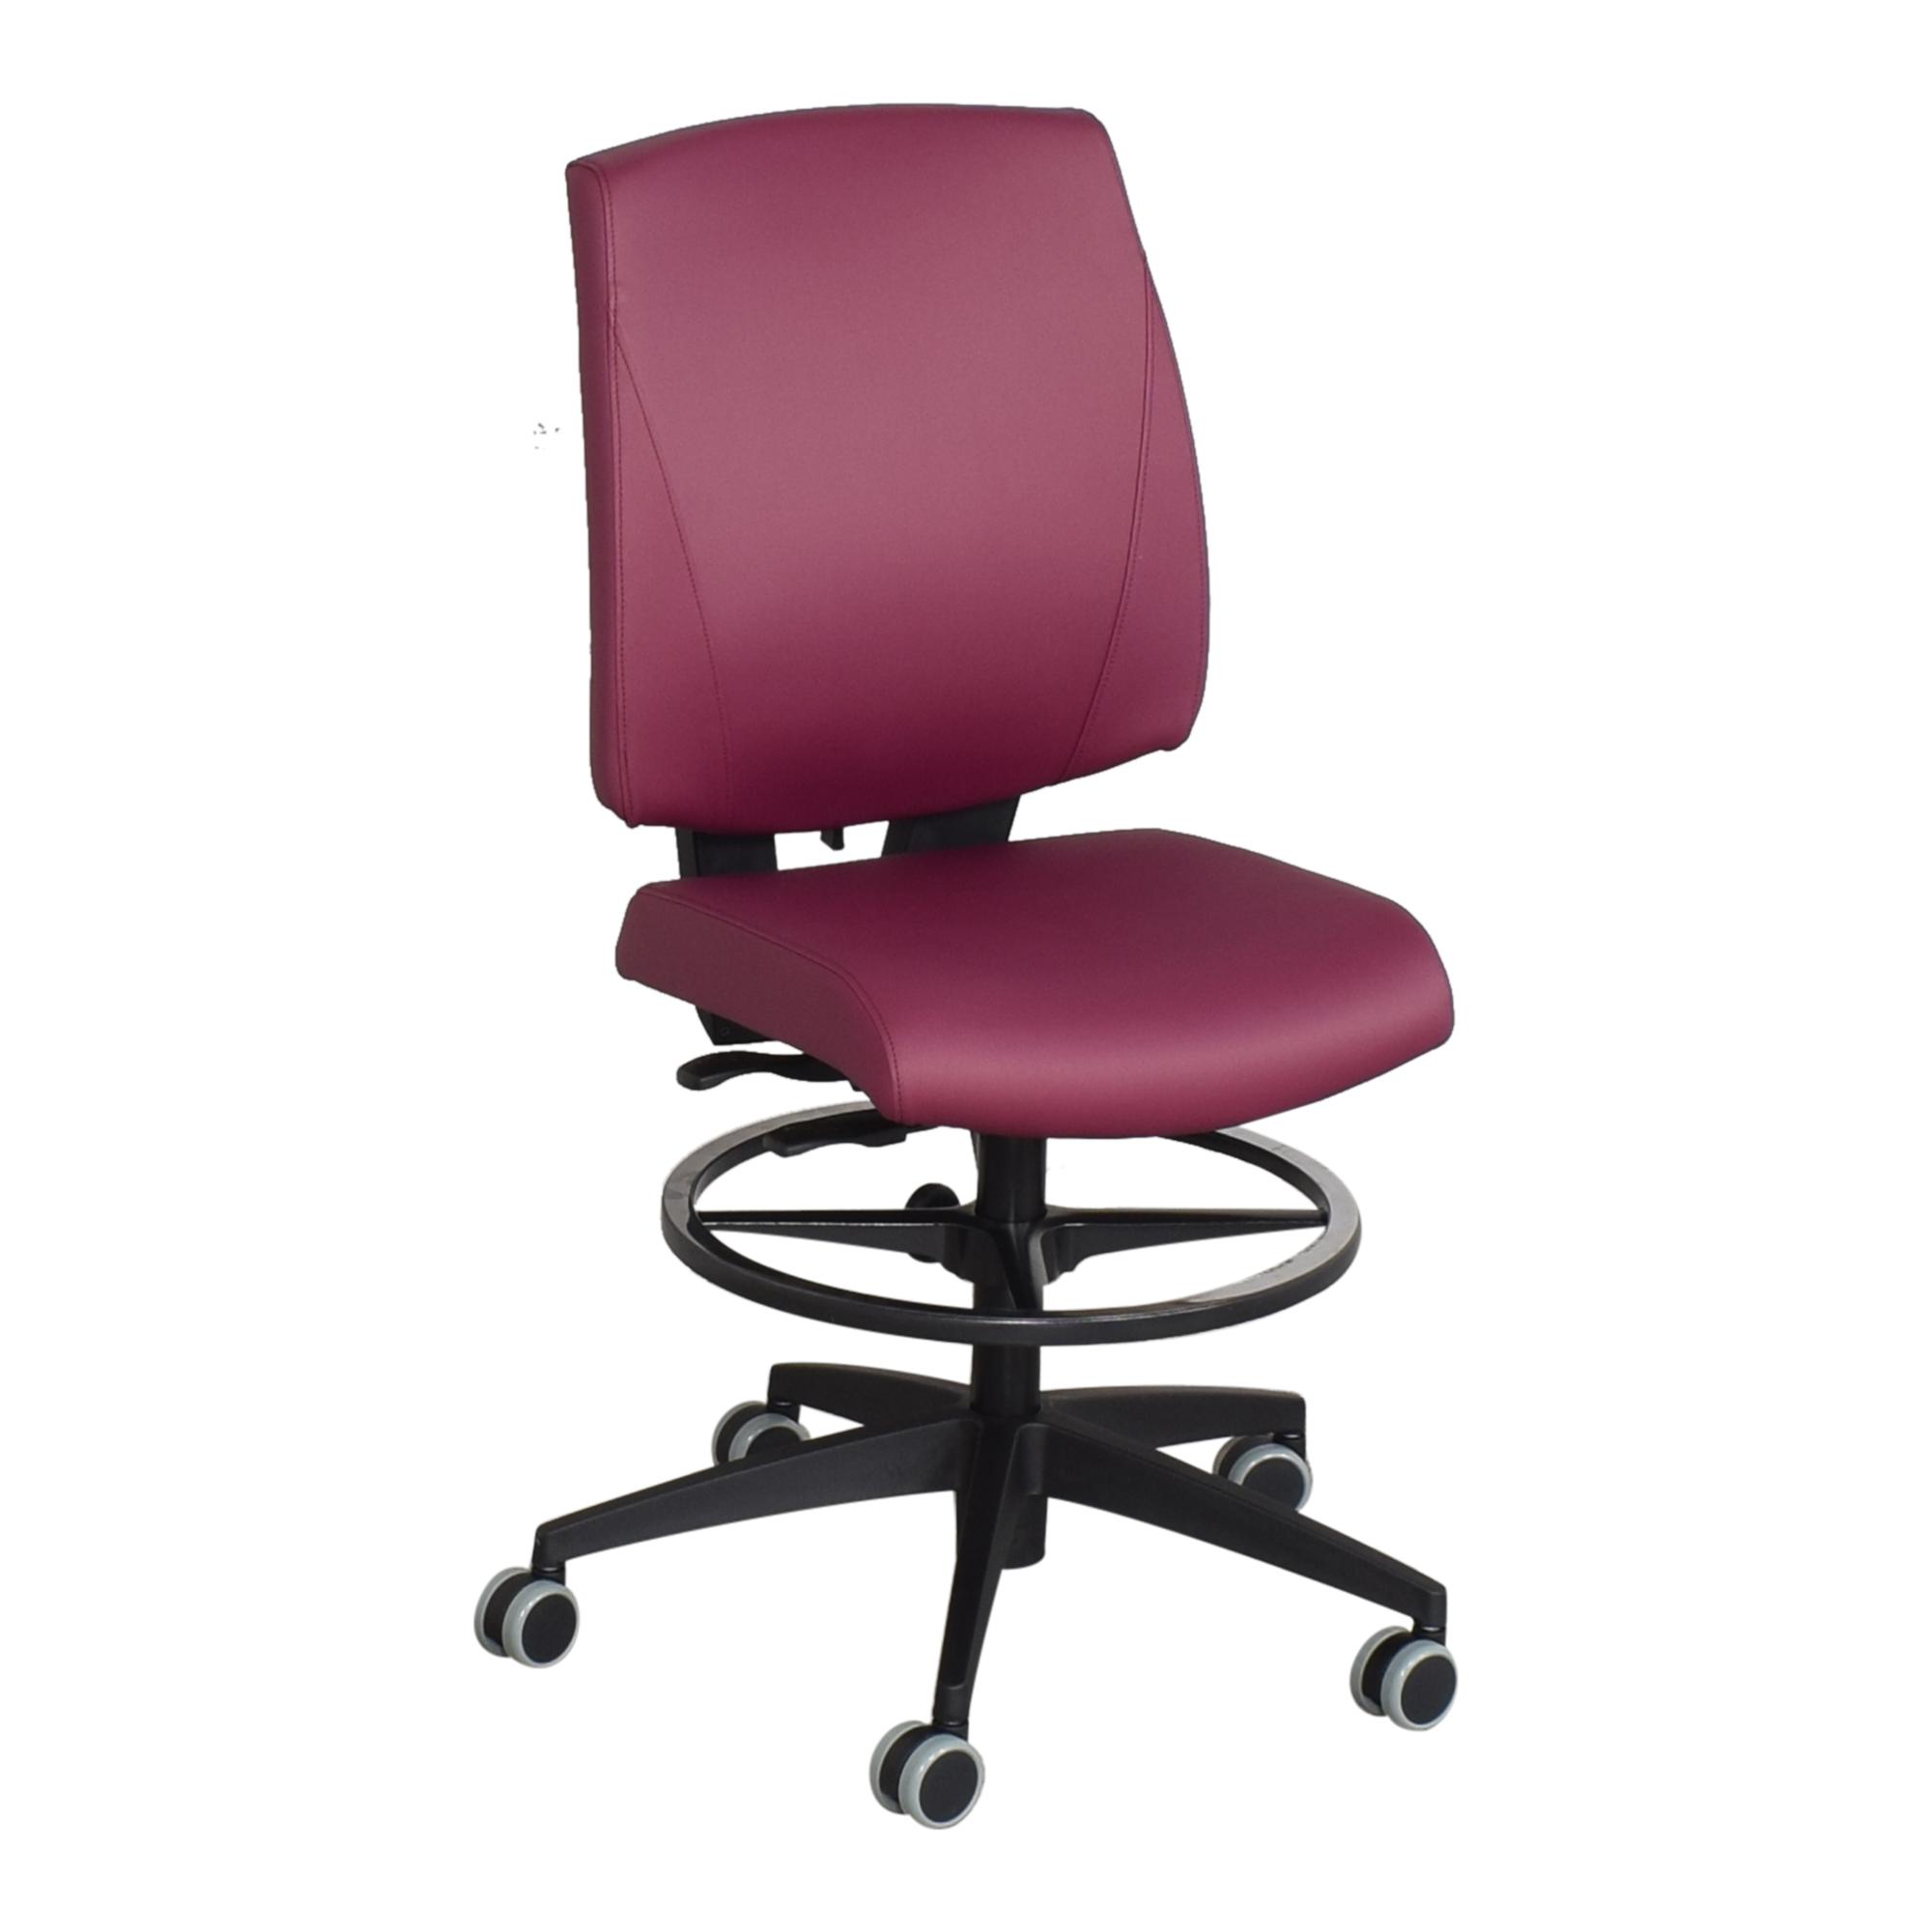 Global Furniture Group Global Furniture Group G1 Ergo Select Drafting Stool dimensions